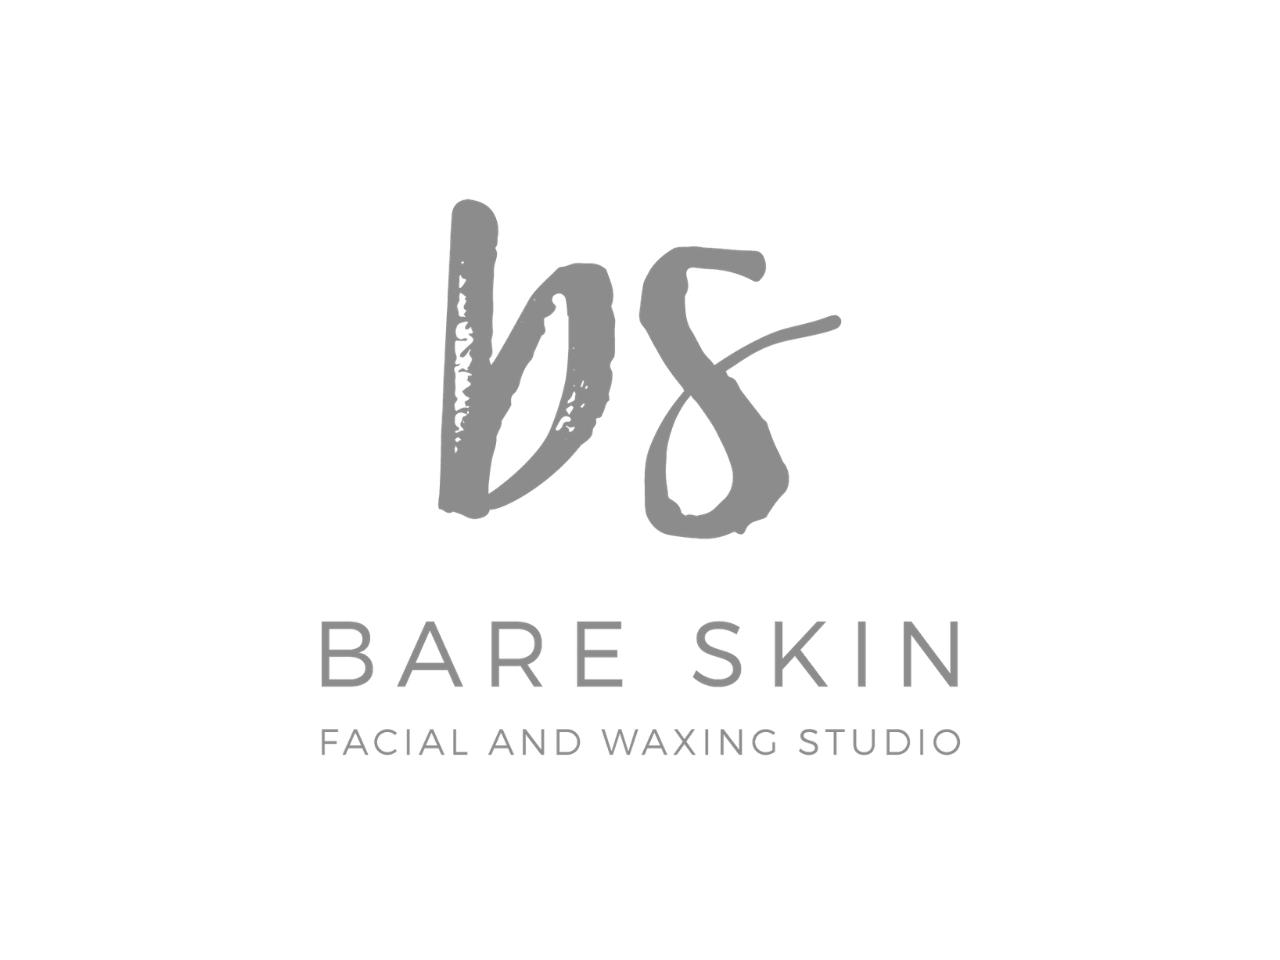 Bare Skin Facial and Waxing Studio